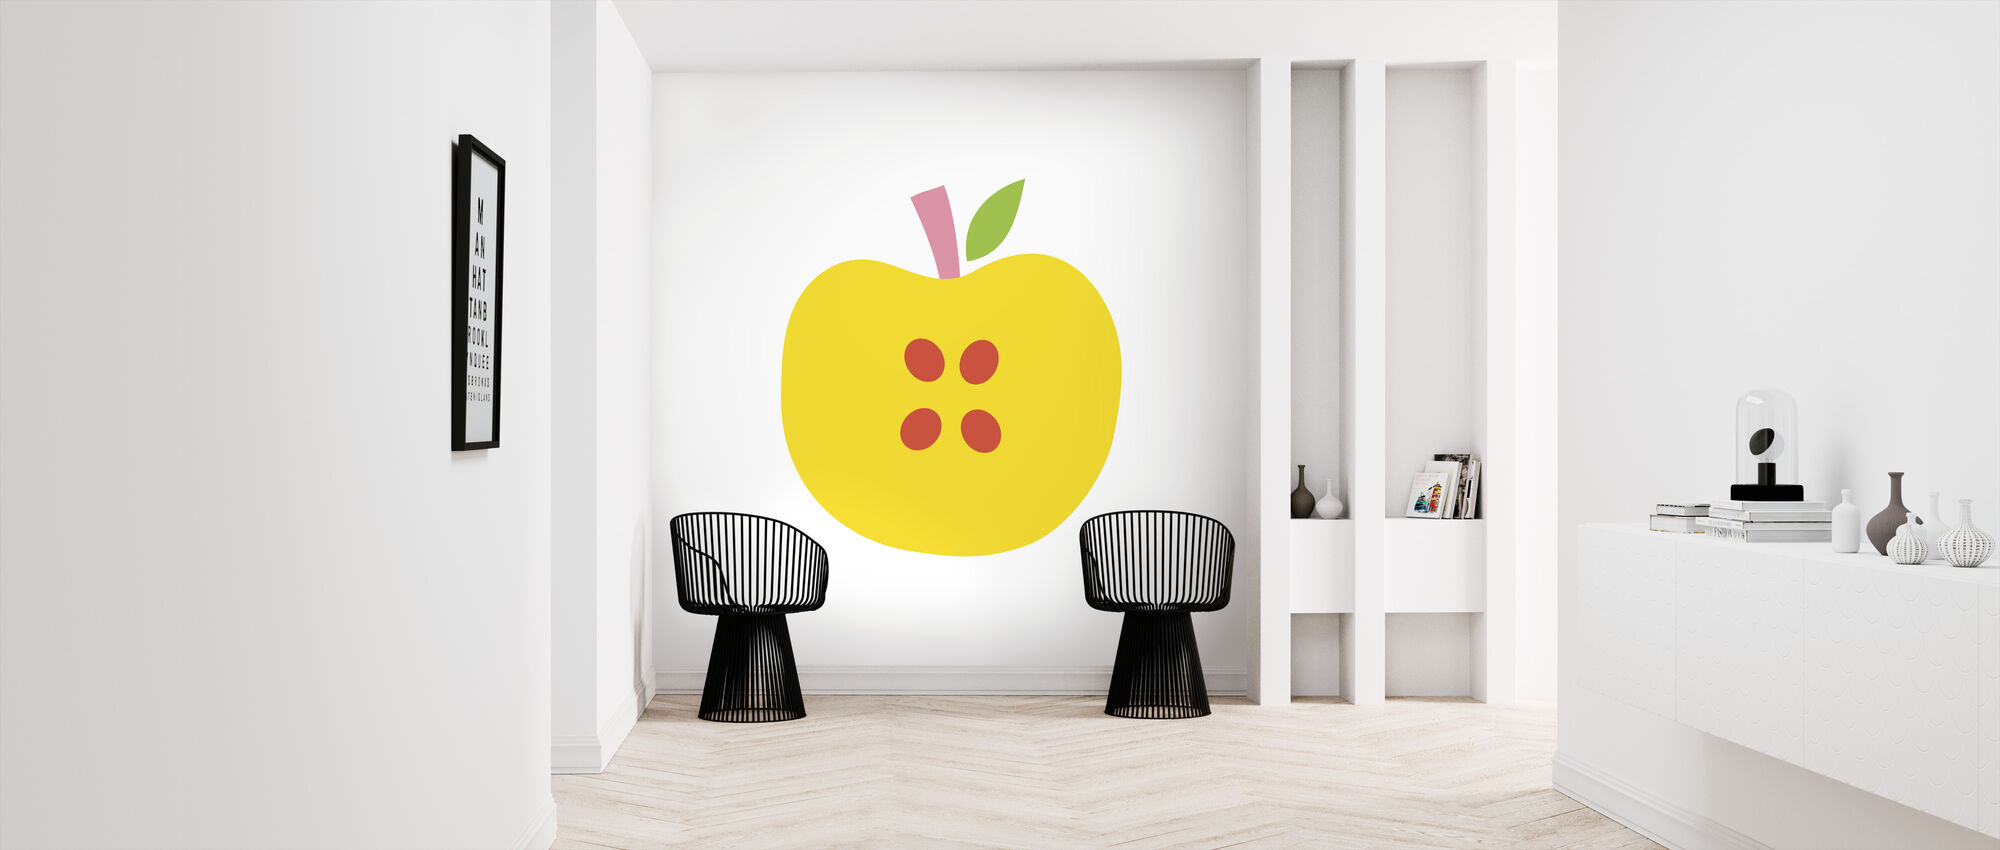 Yellow Apple - Wallpaper - Hallway